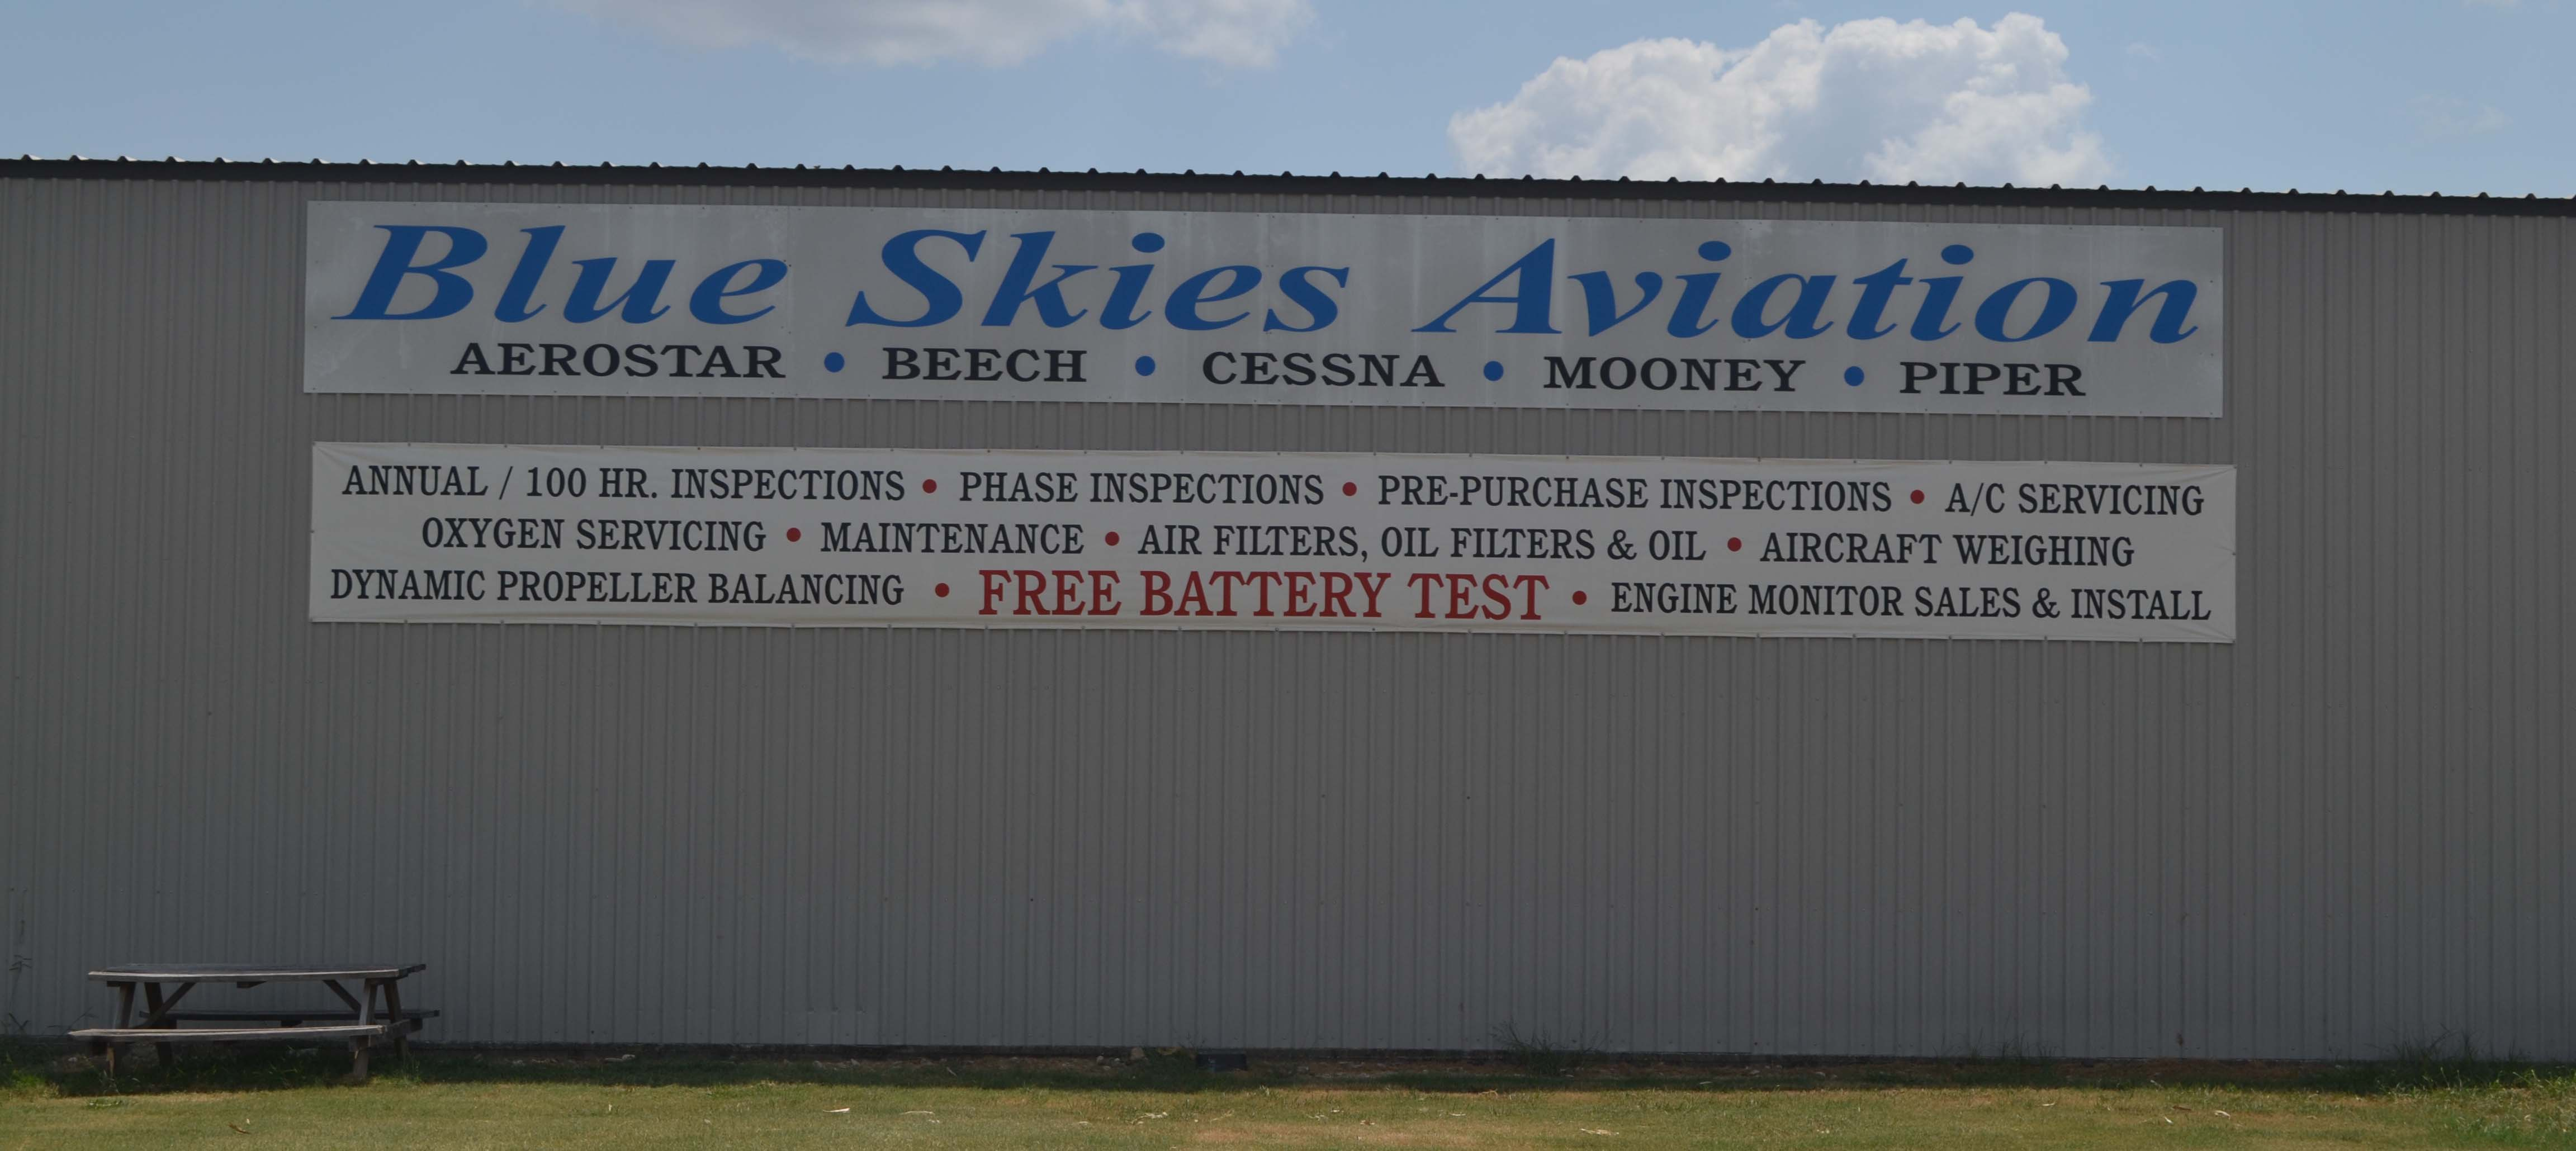 Blue Skies Aviation KHYI San Marcos Regional Airport GA Maintenance, Inspections, Installations